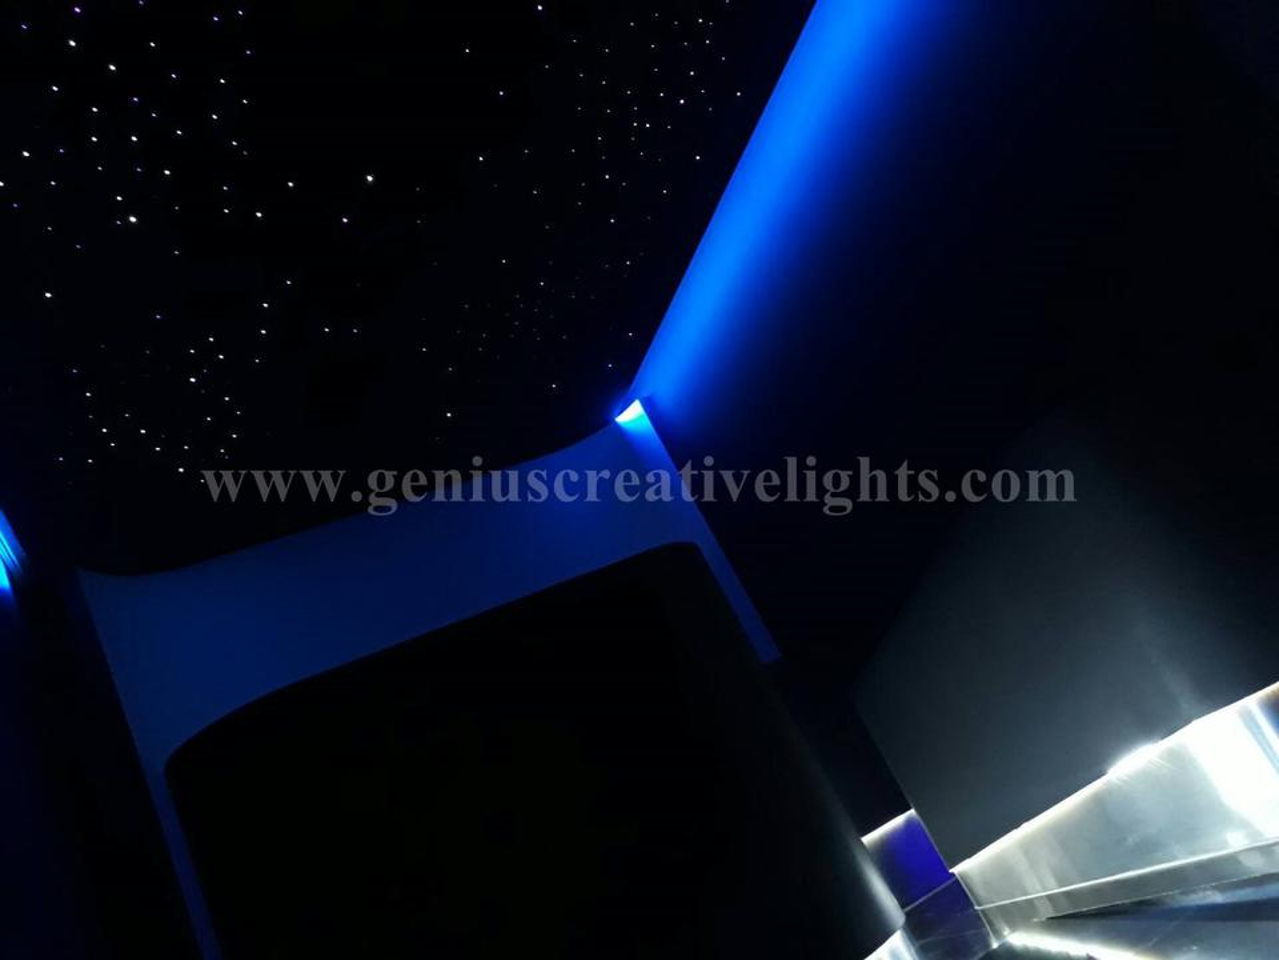 Fiber optic stars ceiling(ดาวบนฝ้าเพดาน) รูปที่ 6